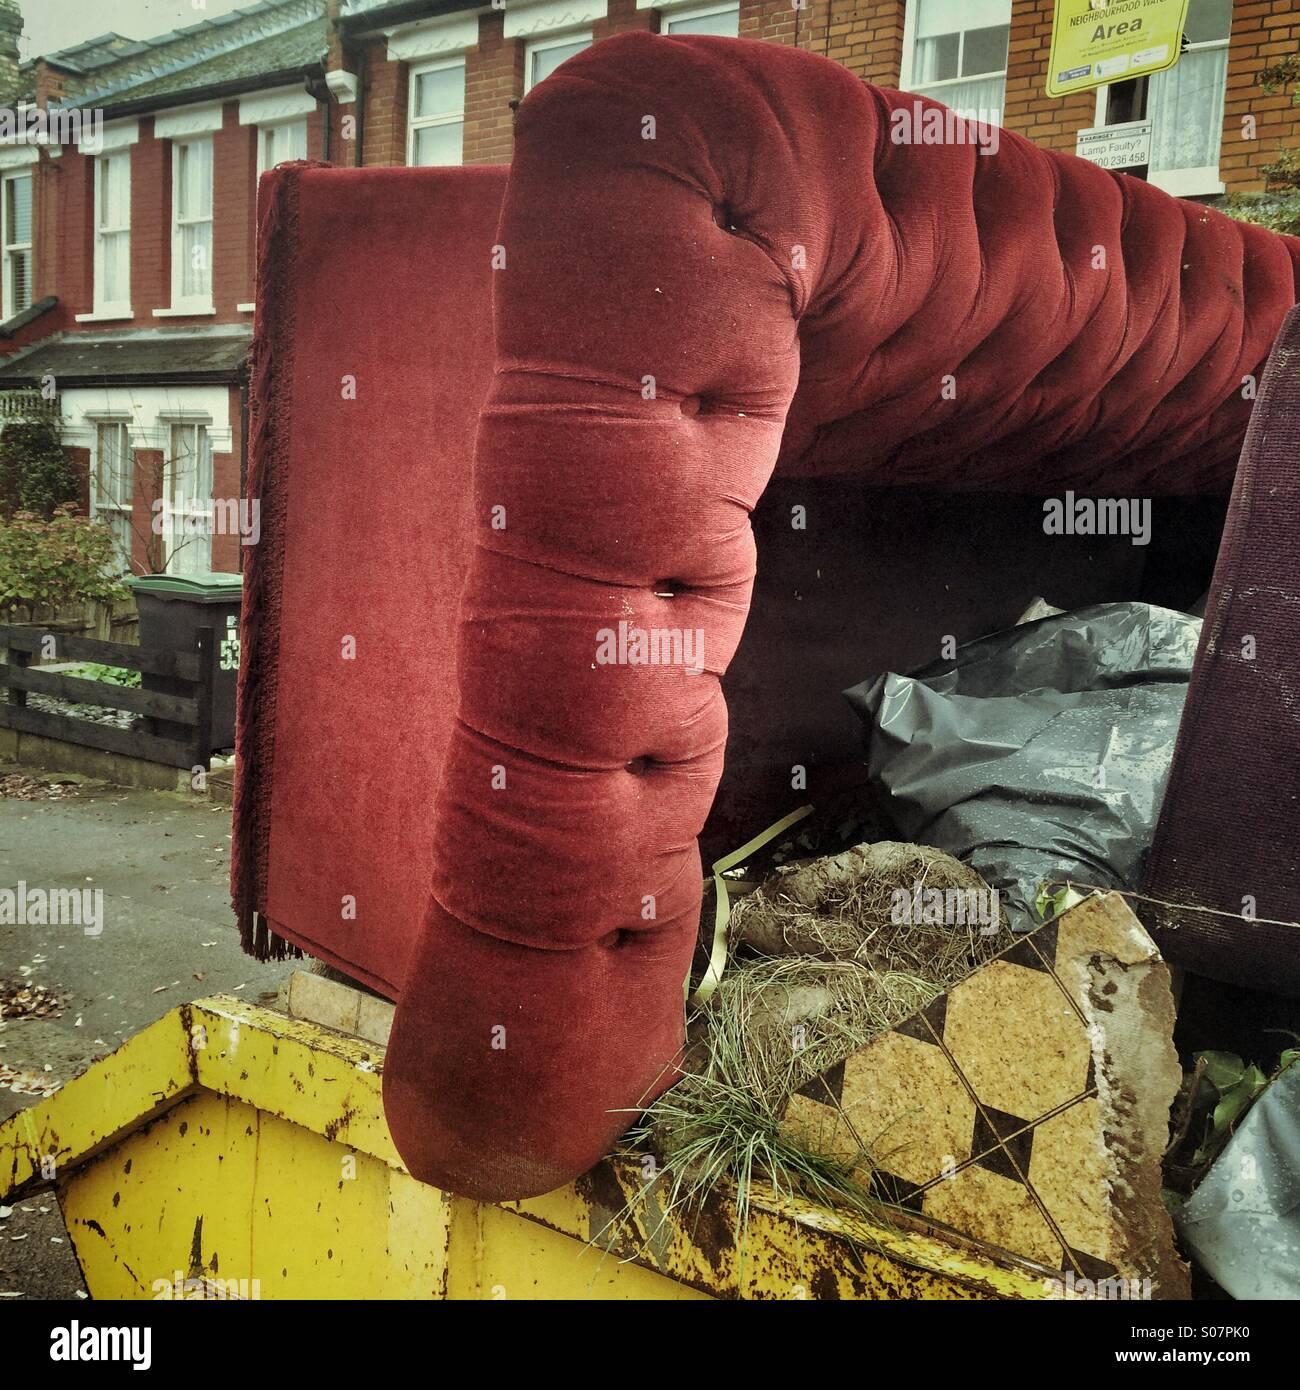 A sofa in a skip - Stock Image